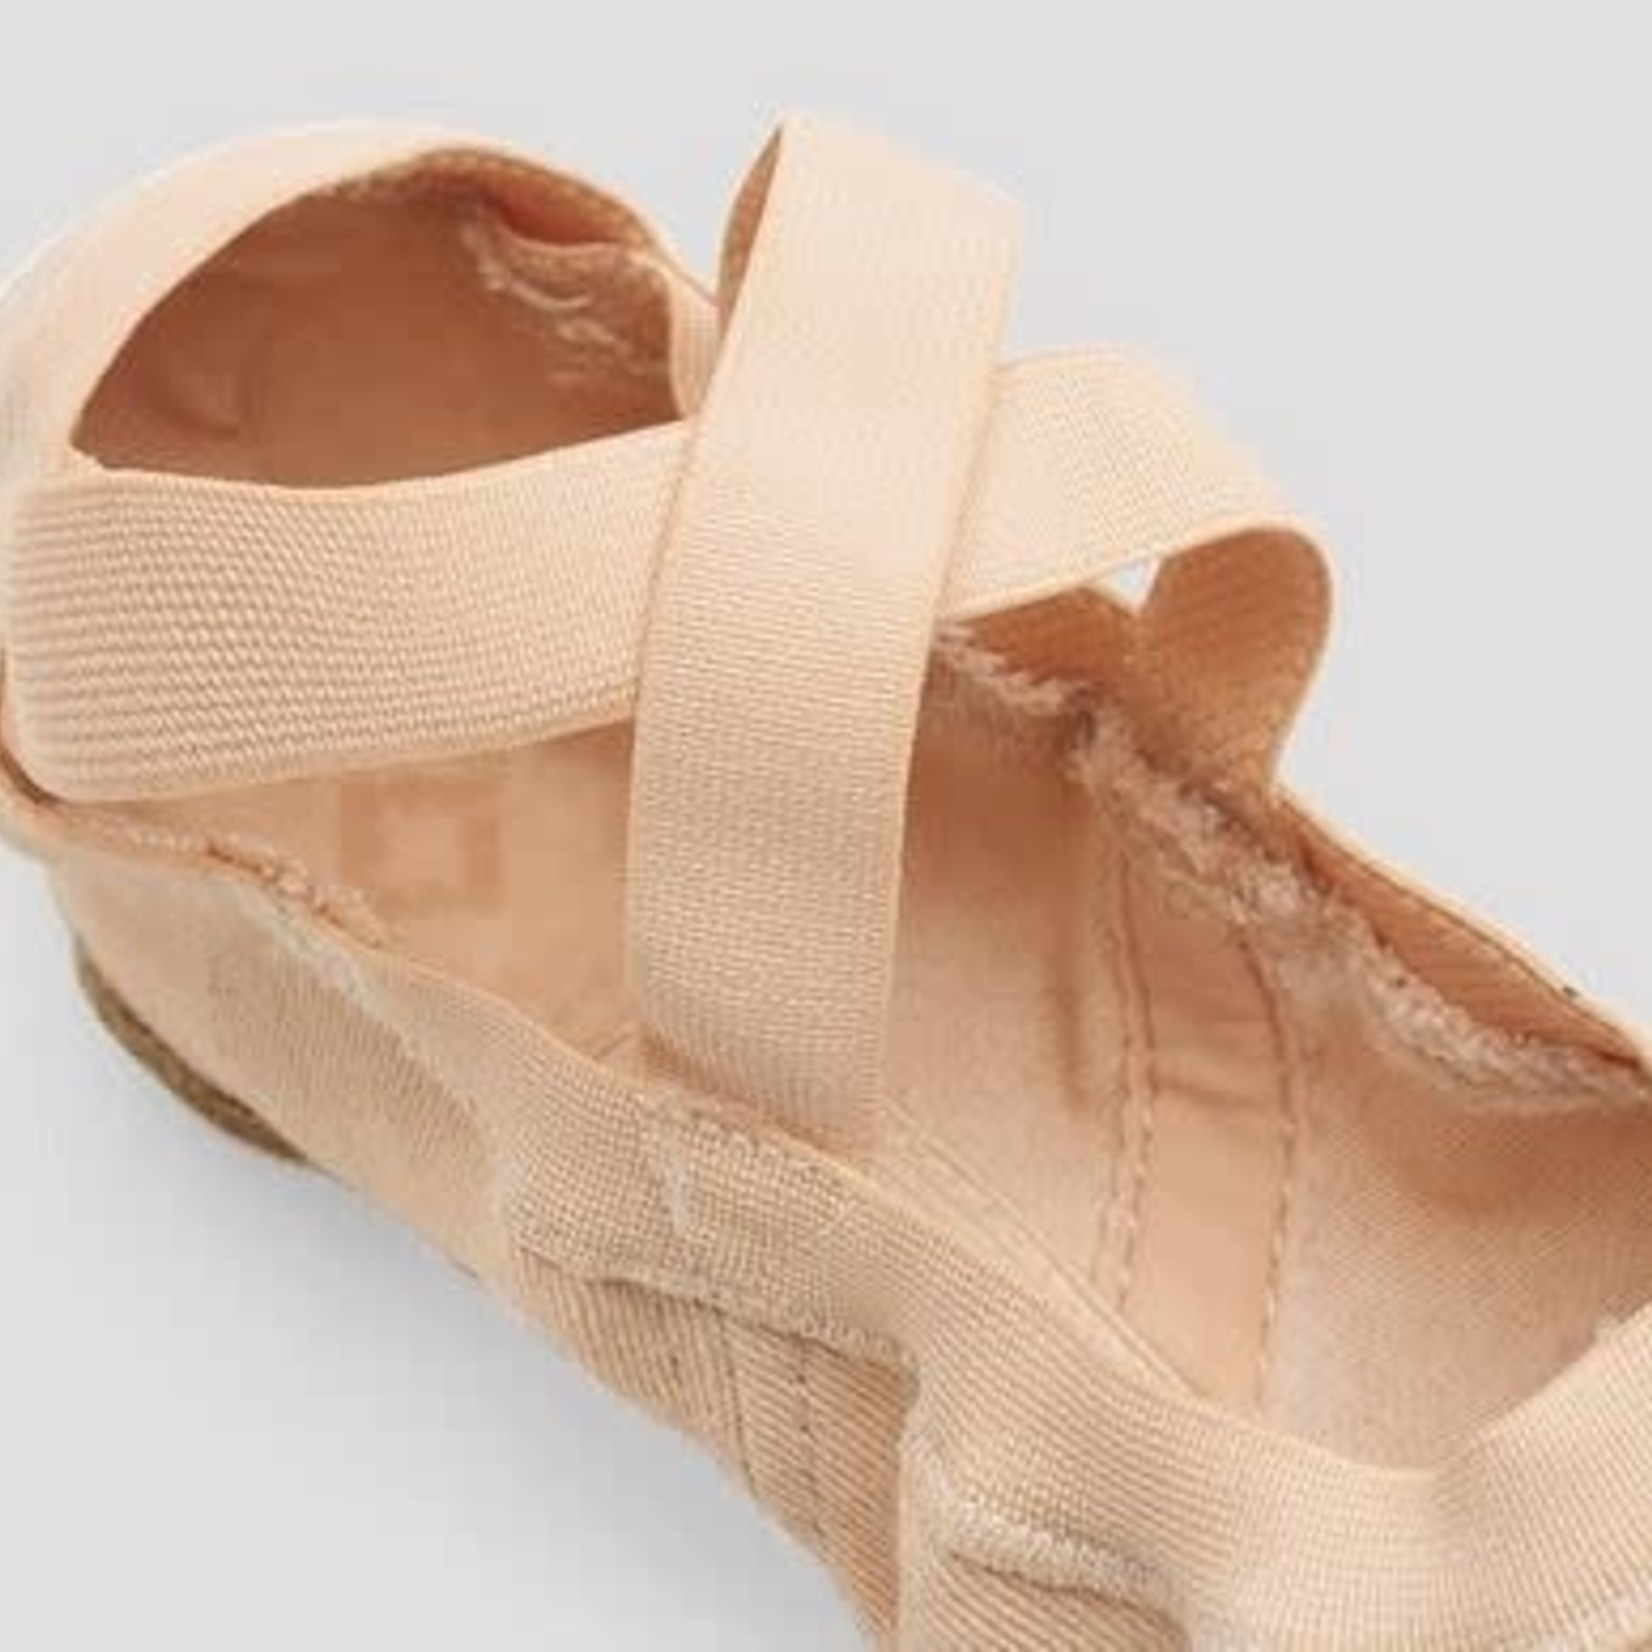 Bloch Bloch S0625L Synchrony Canvas Ballet Shoe